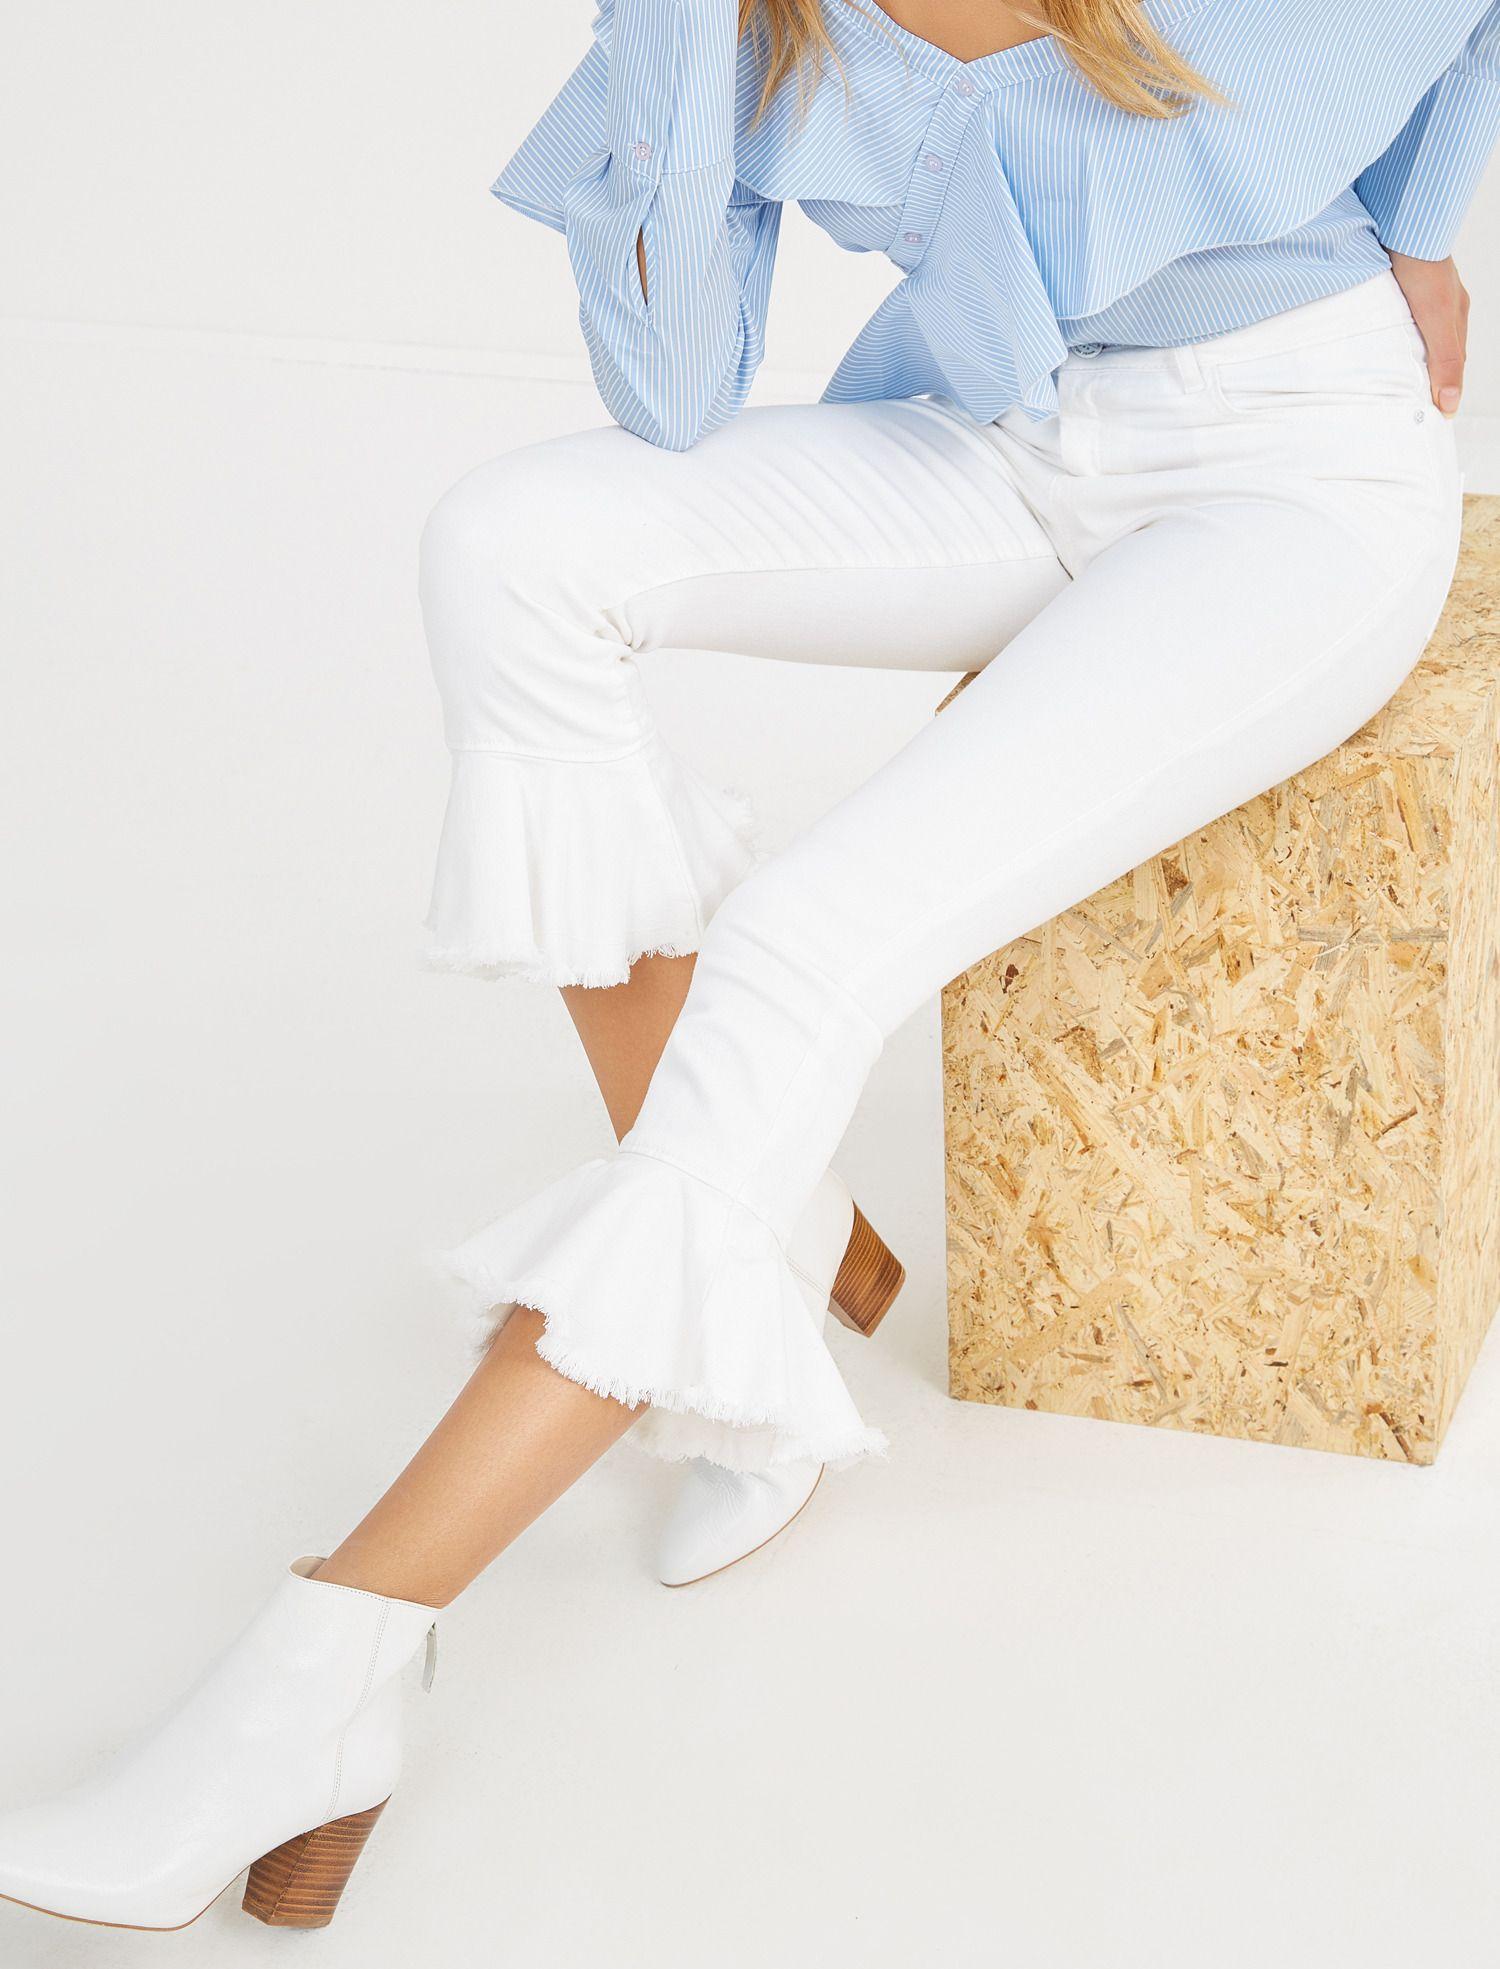 Koton Koton Kadin Fahriye Evcen For Koton Jeans Pantolon Moda Stilleri Pantolon Kadin